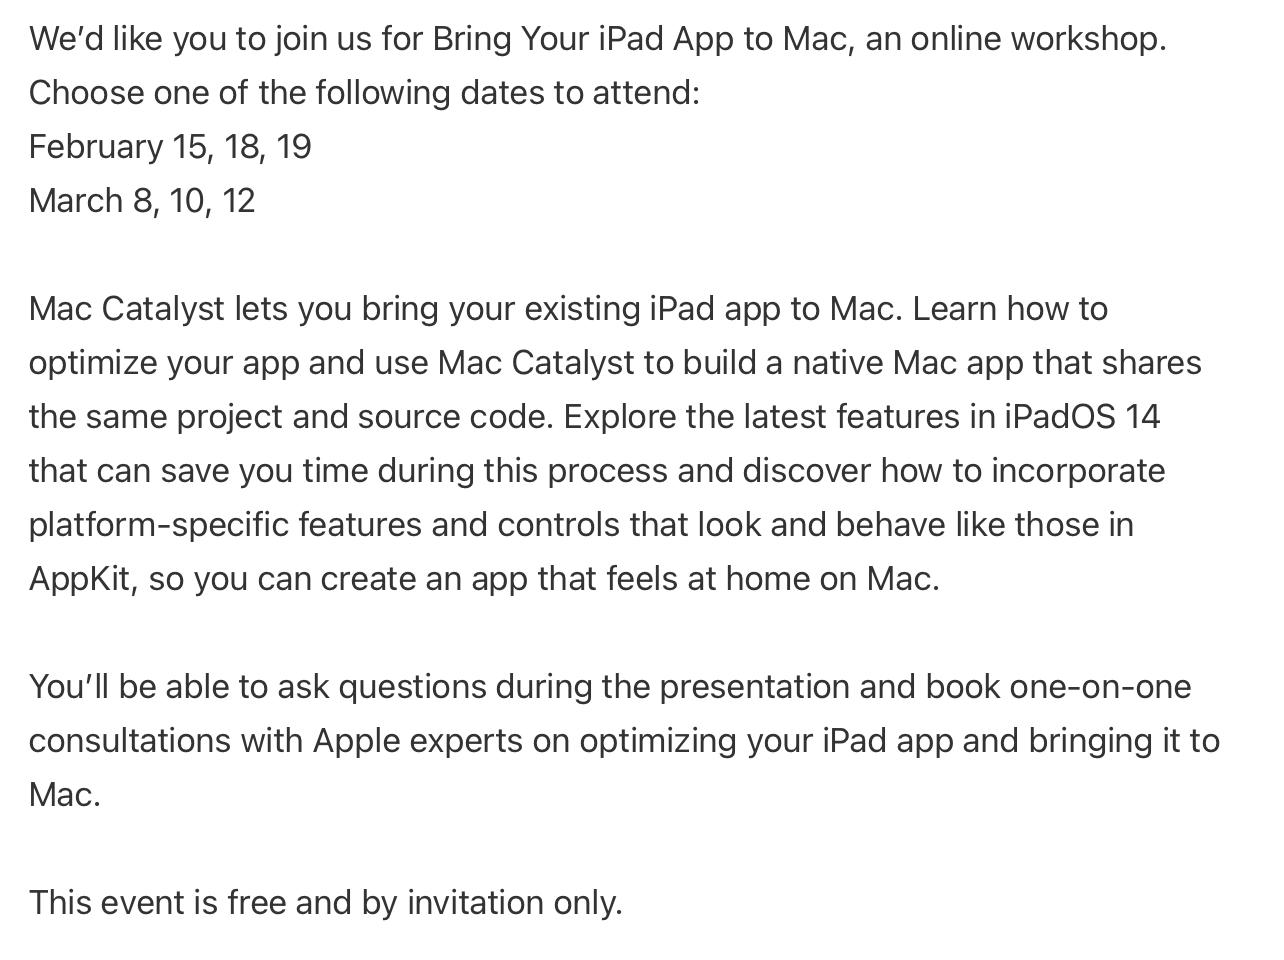 Bring Your iPad app to Mac